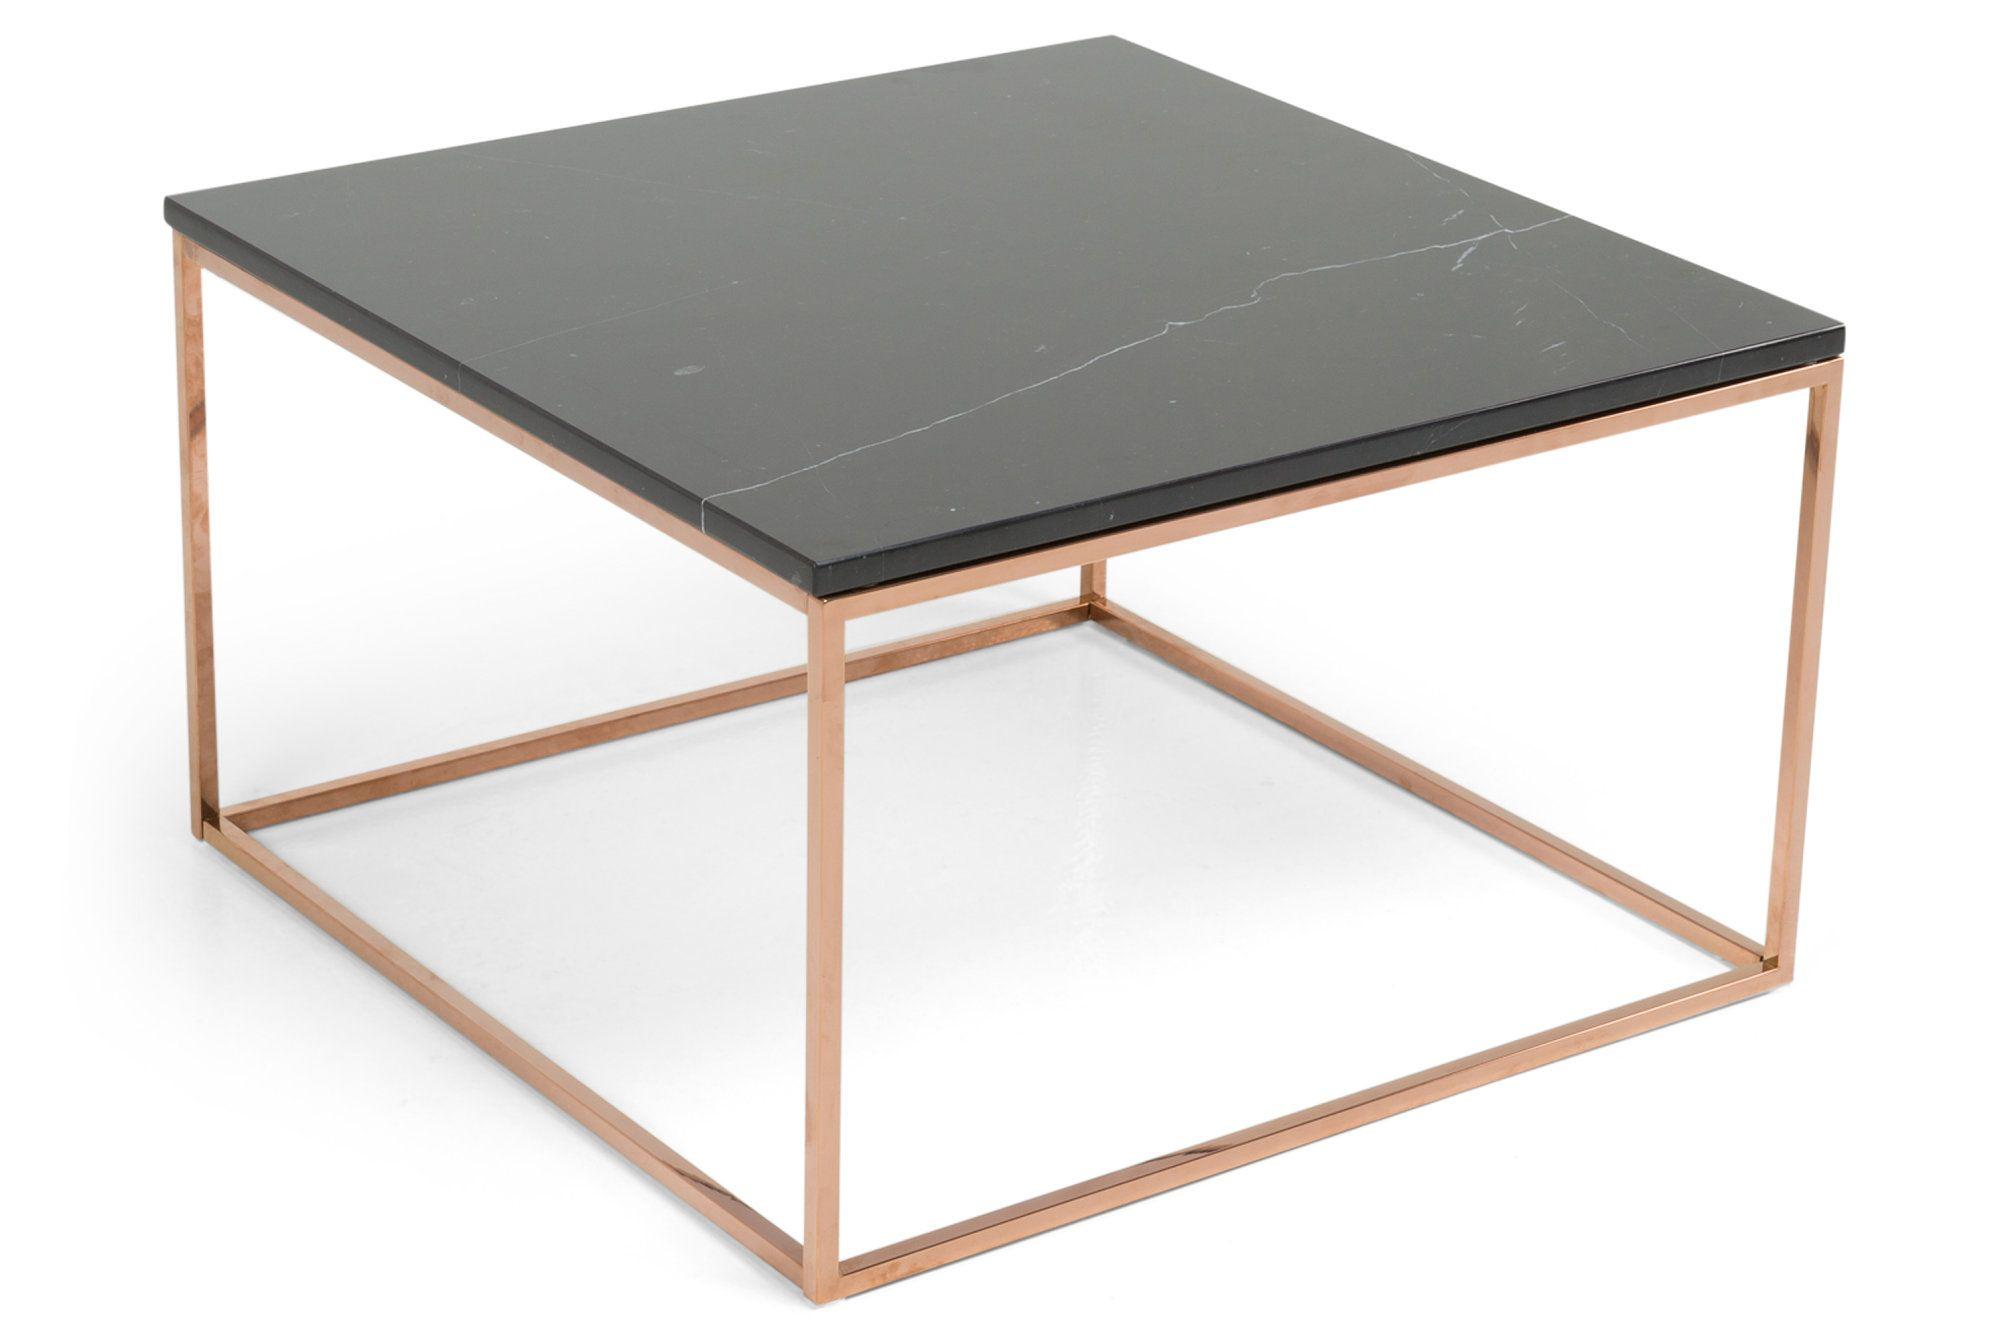 Sofabord Titania Svart Marmor Kobber 75x75x45 cm Chilli no Livingroom Design